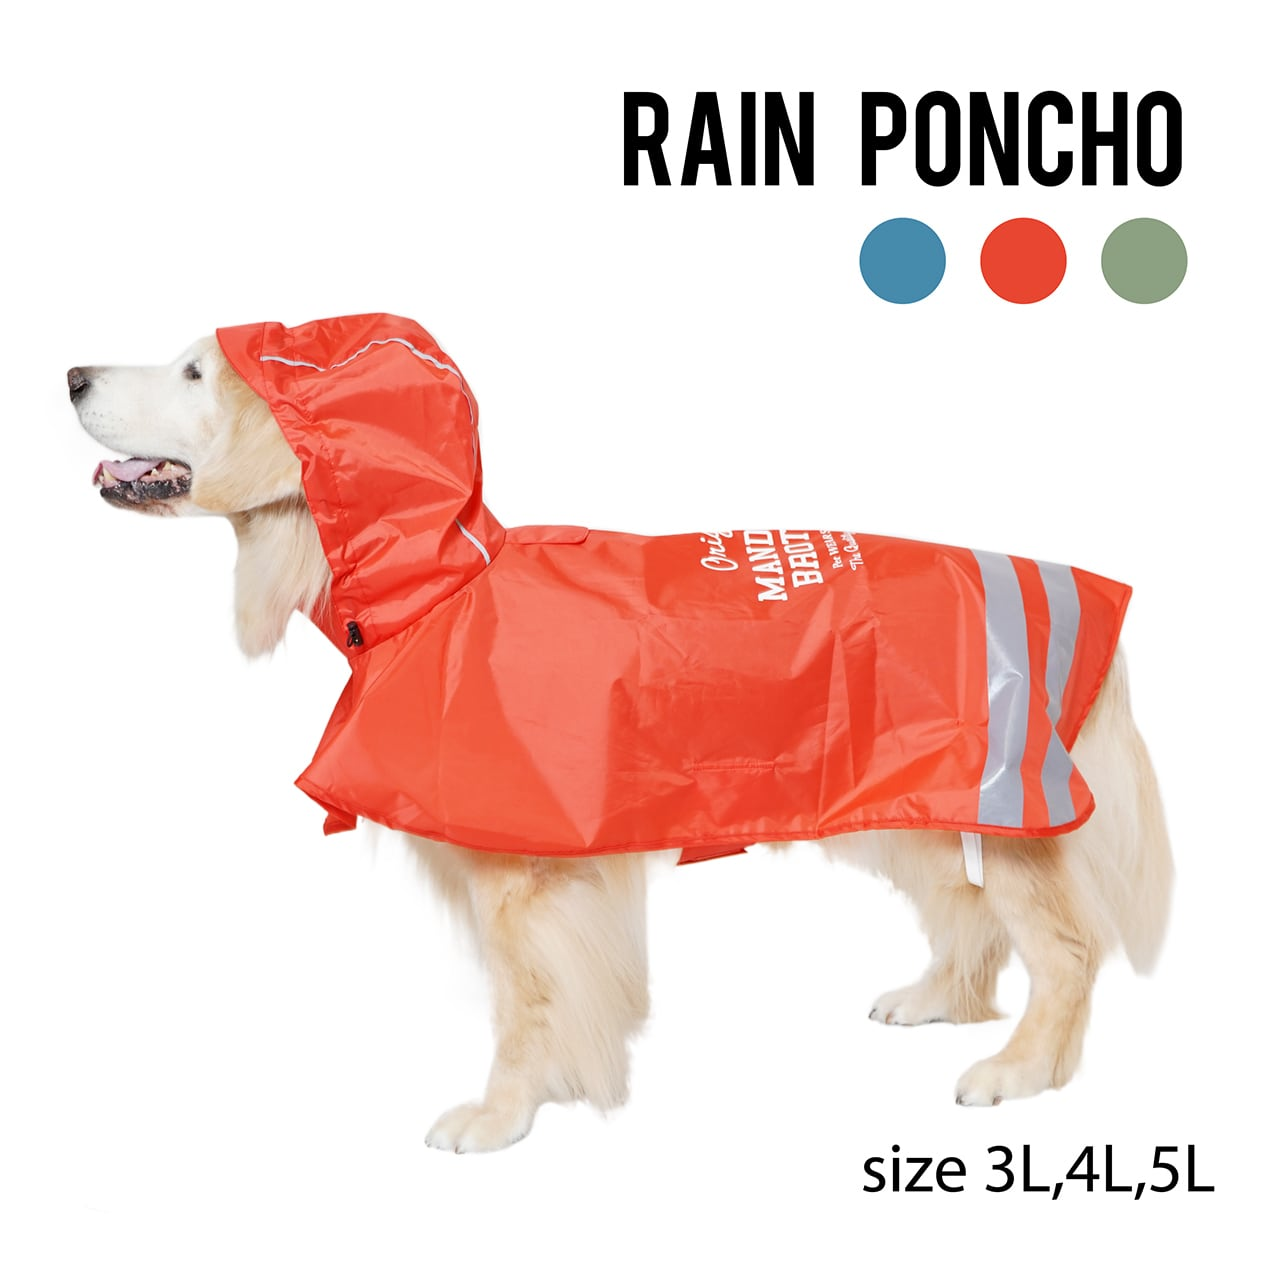 RAIN PONCHO(3L,4L,5L) レインポンチョ